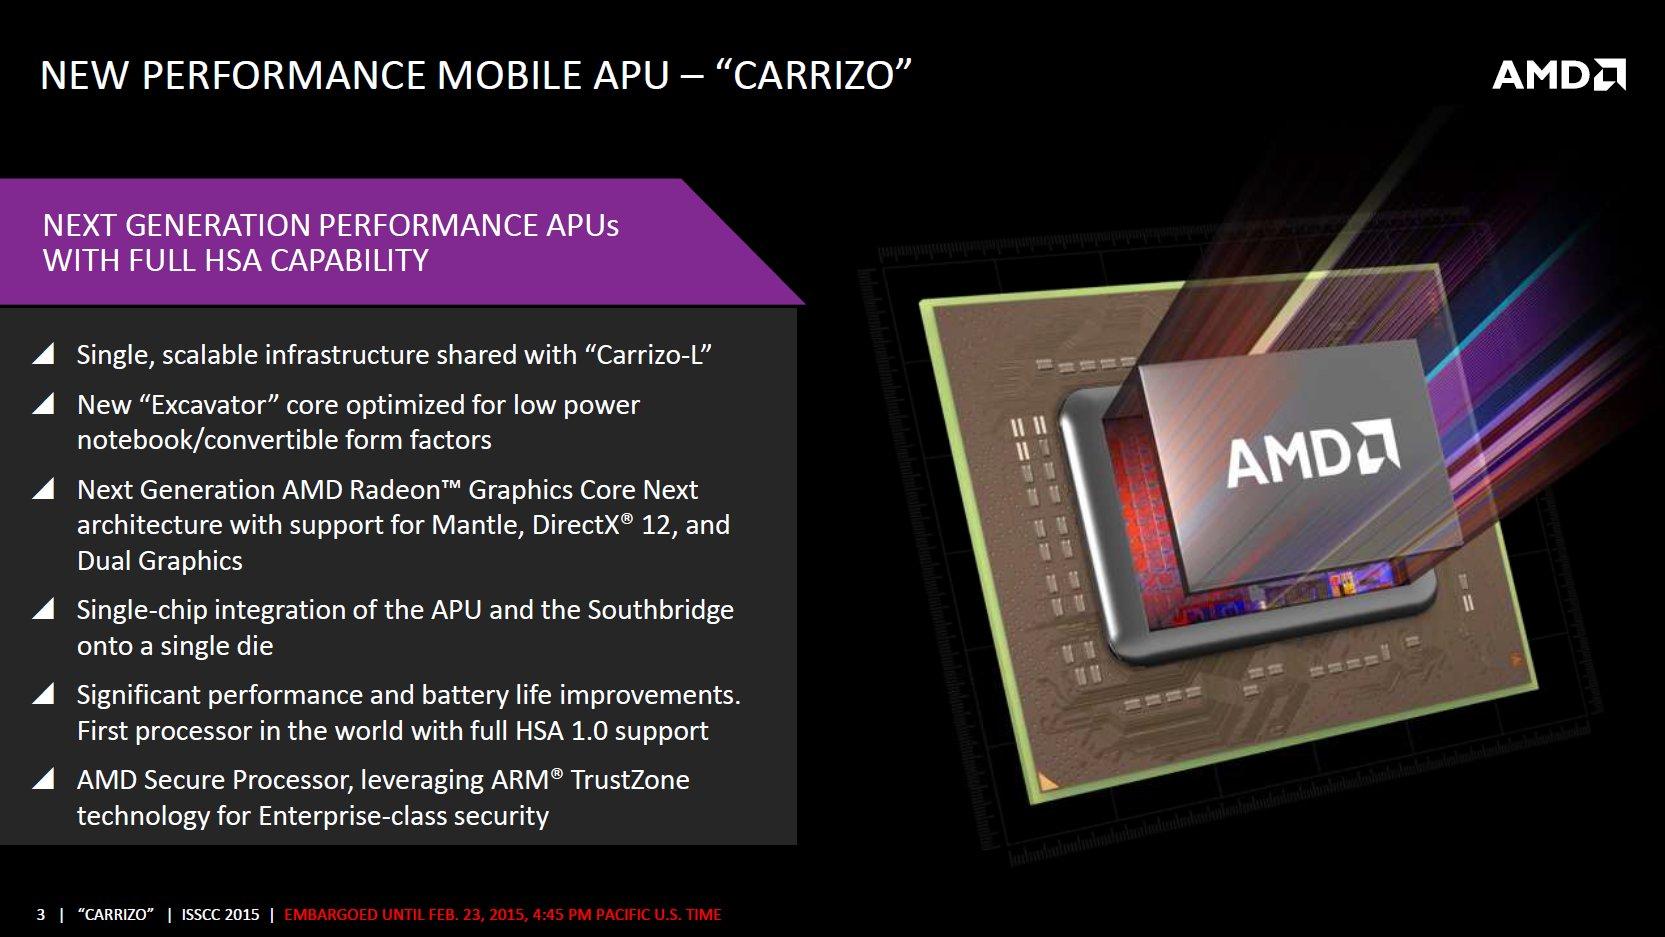 Überblick zu AMD Carrizo